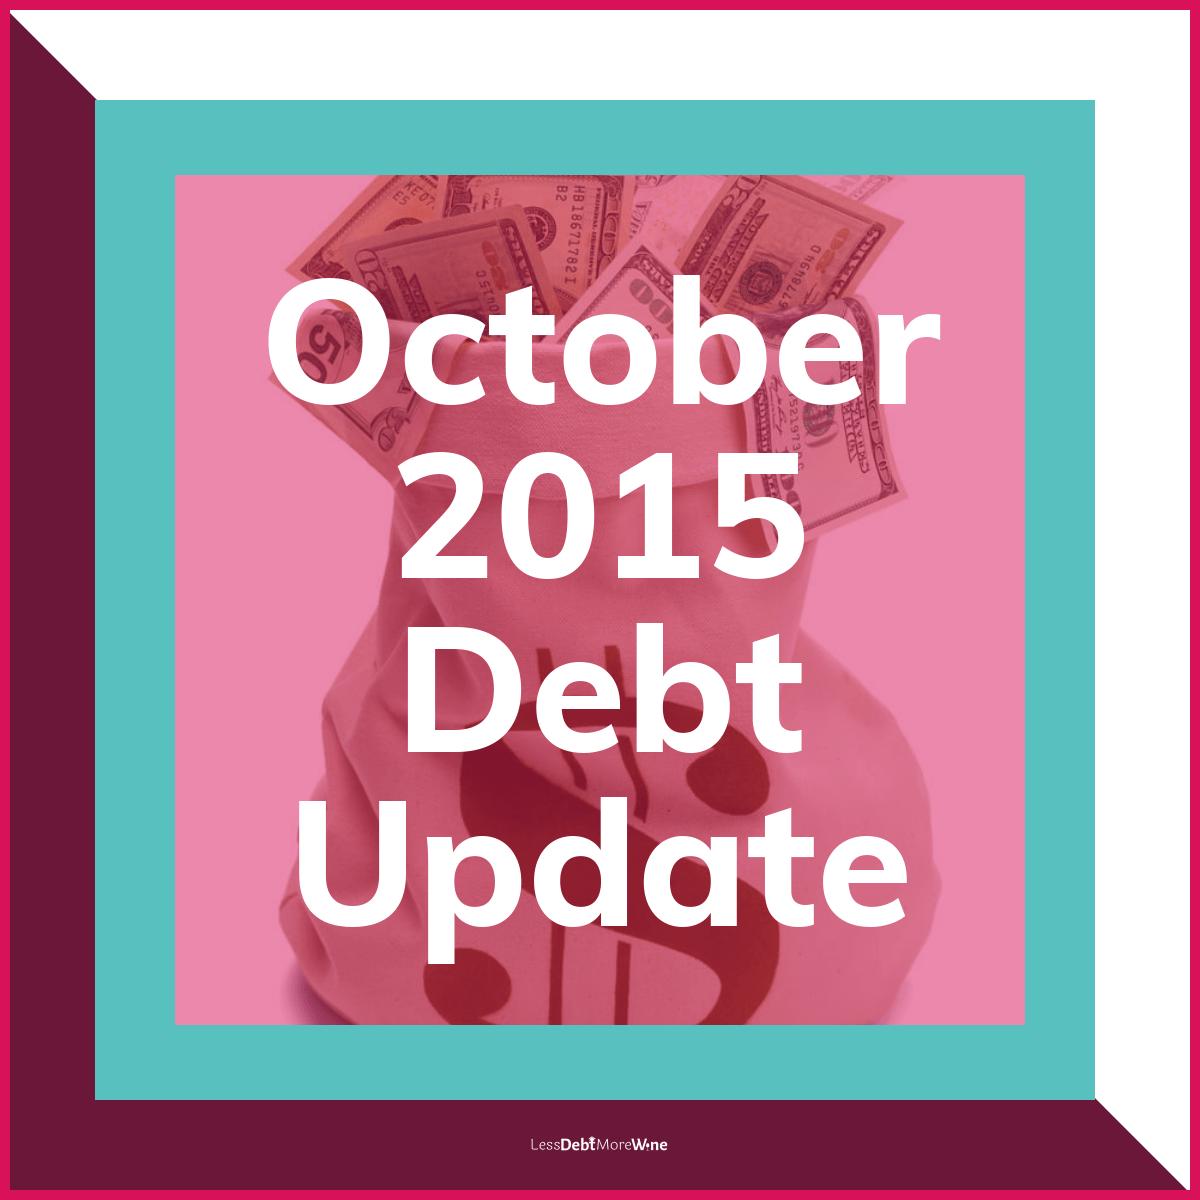 October 2015 Debt Update, debt payoff progress